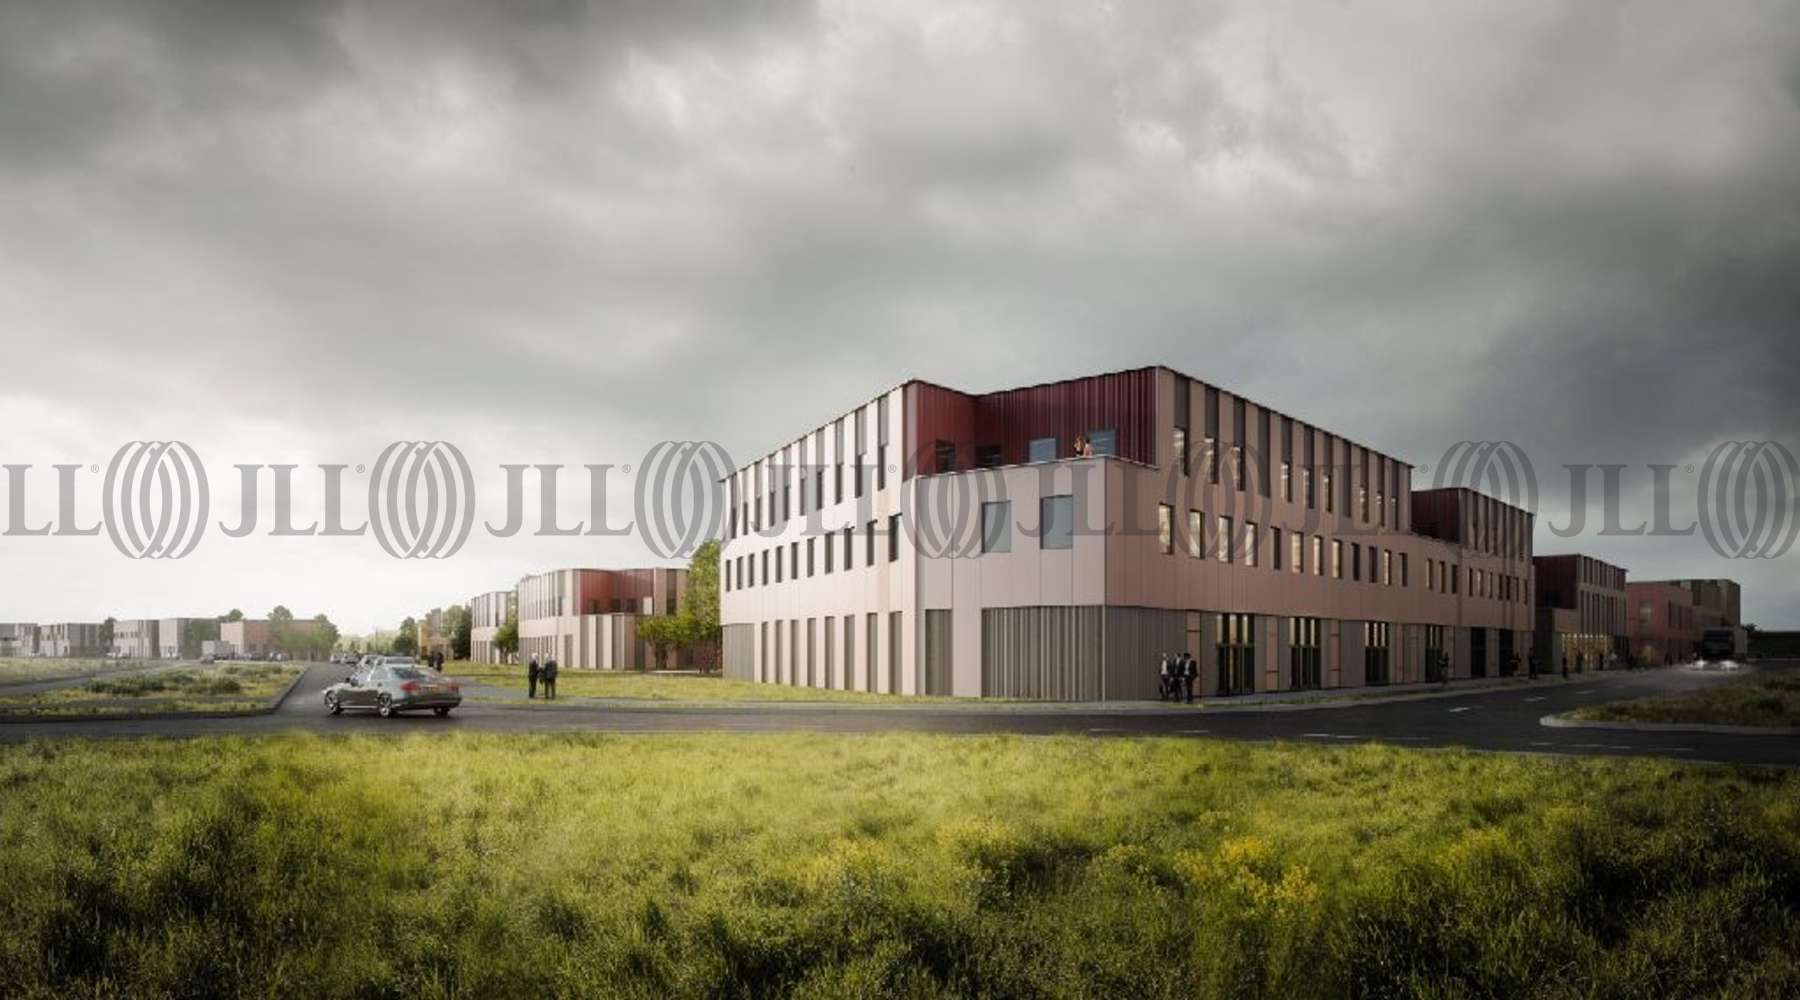 Activités/entrepôt Tremblay en france, 93290 - ZAC AEROLIANS (CLUSTER-PARC LOCATIF) A3 - 10869507